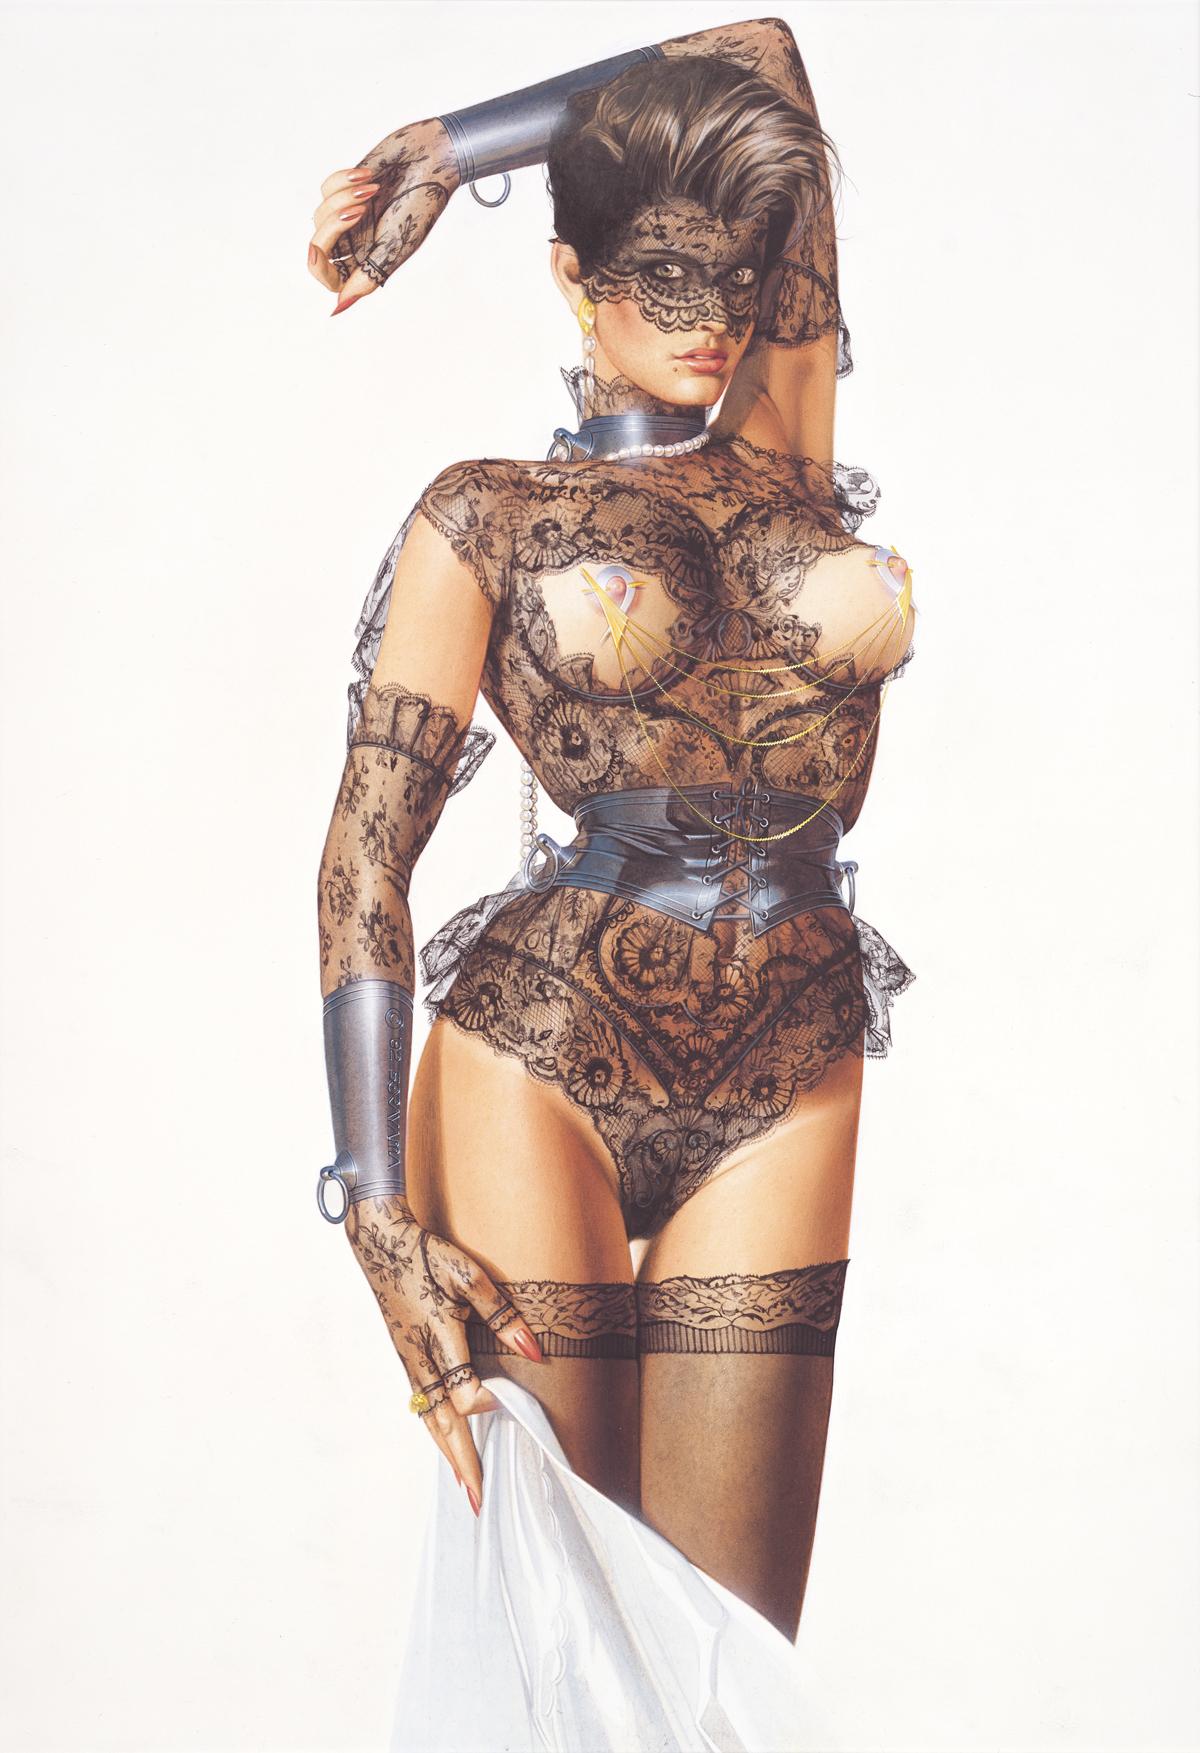 Hajime-Sorayama-Upper-Playground-Fifty24SF-Sexy-Robot-GIGANTES-004